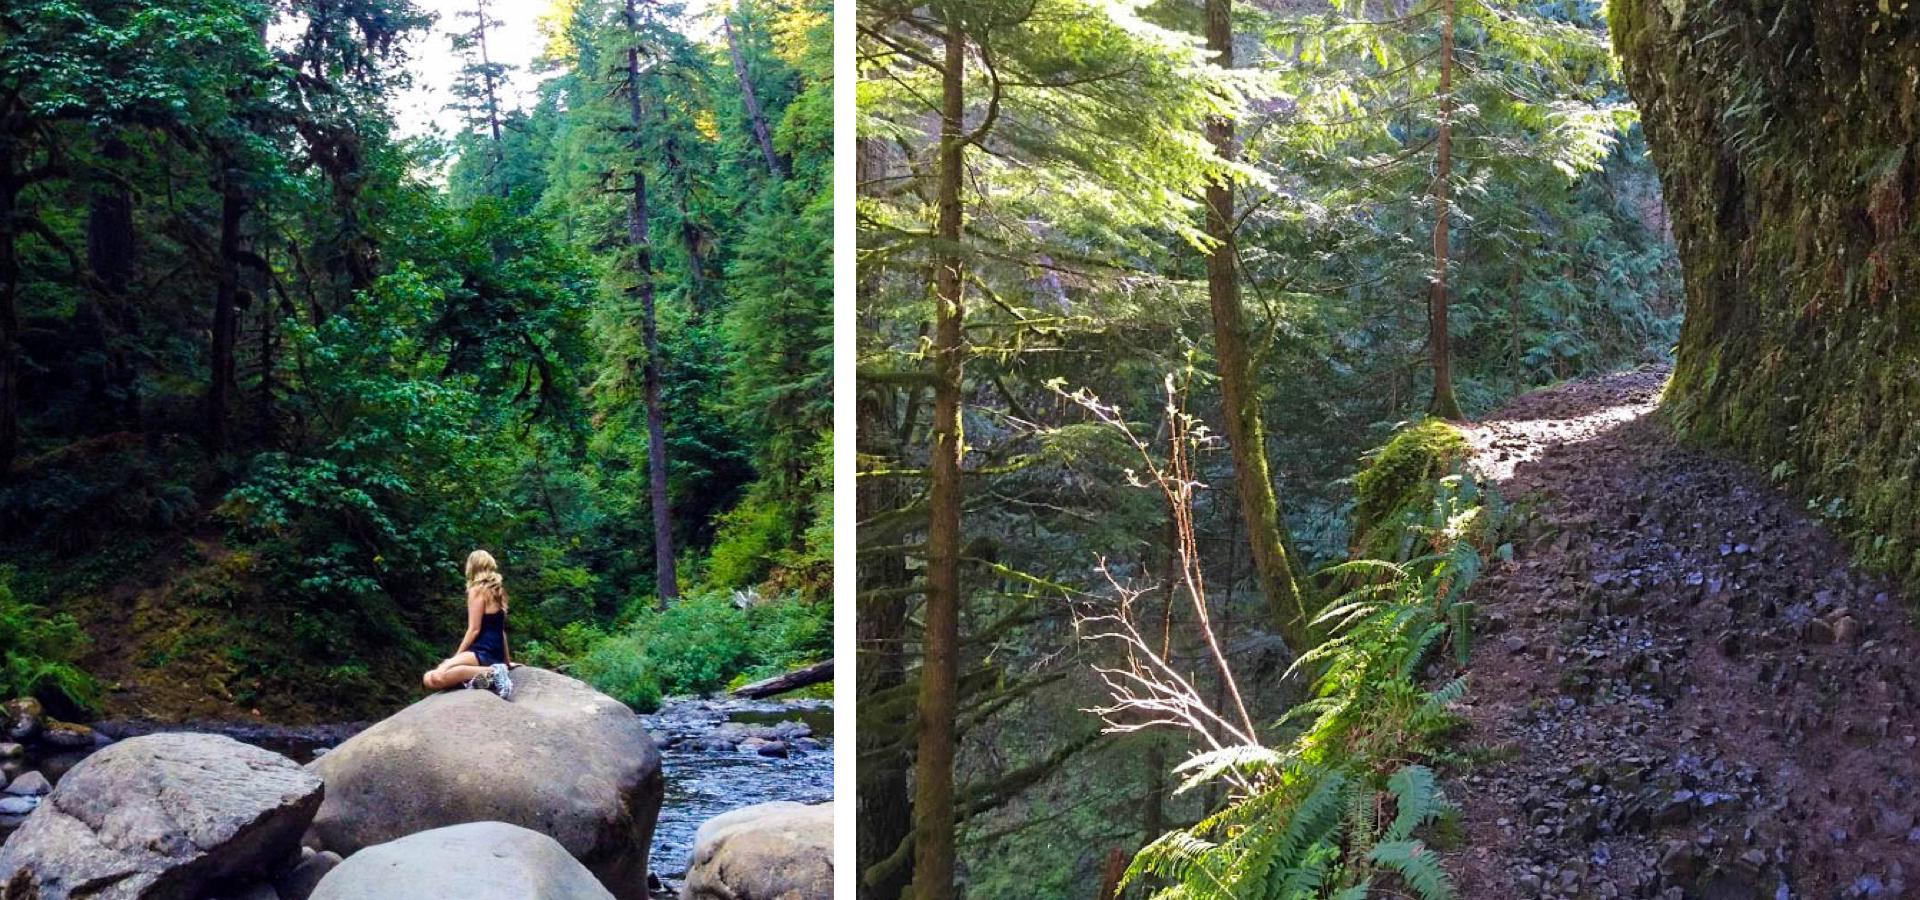 Punchbowl Falls: The best waterfall hikes near portland oregon